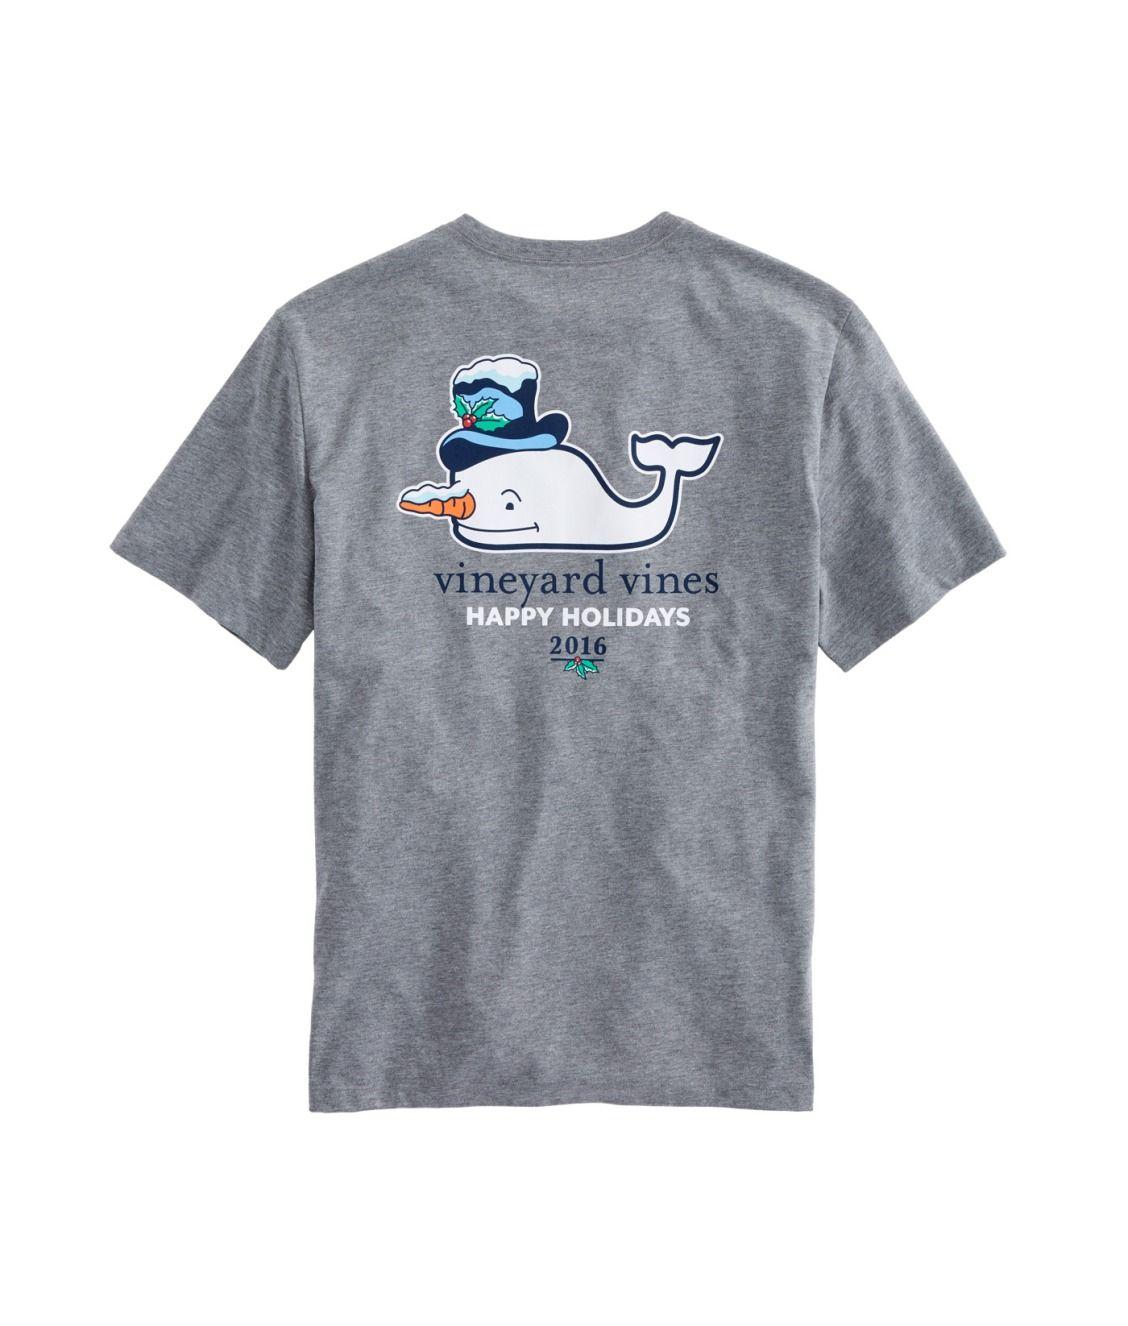 Vineyard Vines Christmas Shirt 2019.Snowman Whale Vineyard Vines Tee 2016 Edsftg Happy